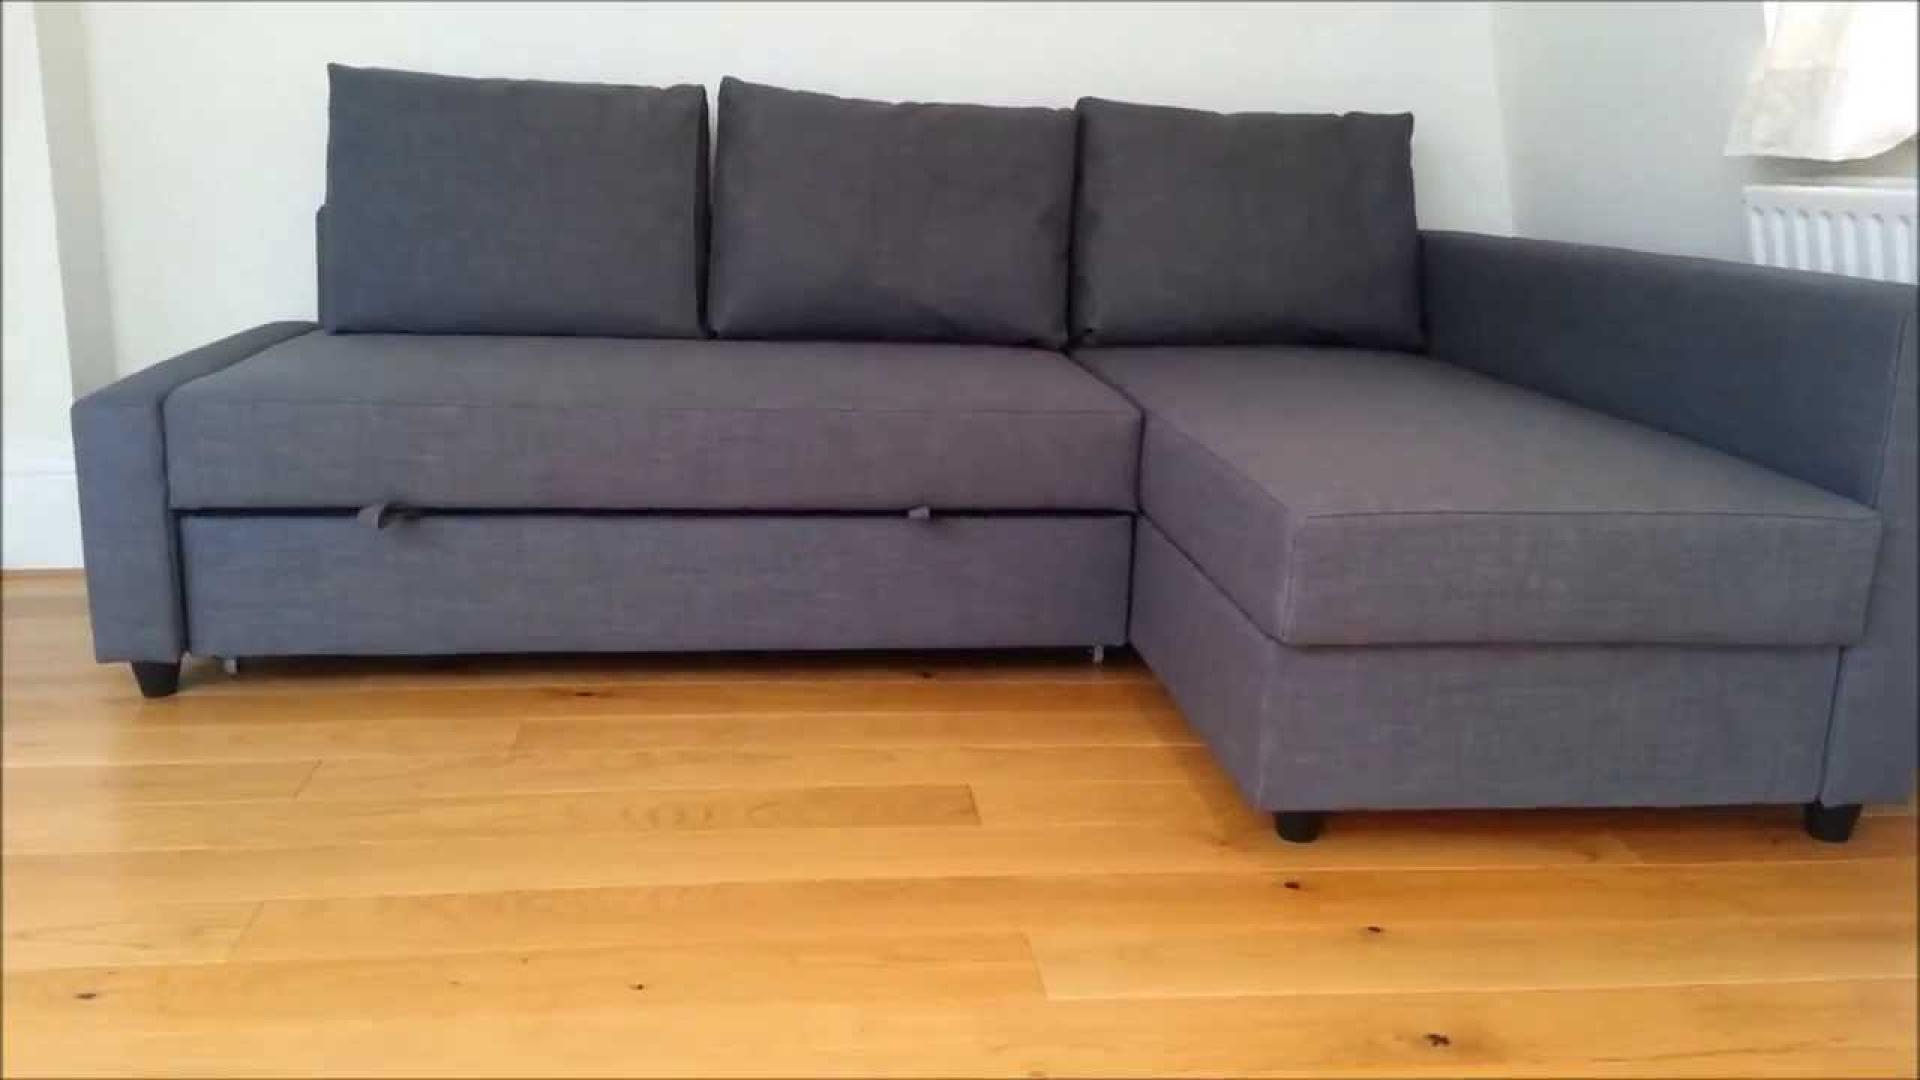 Canapé Friheten Ikea Avis - Photos